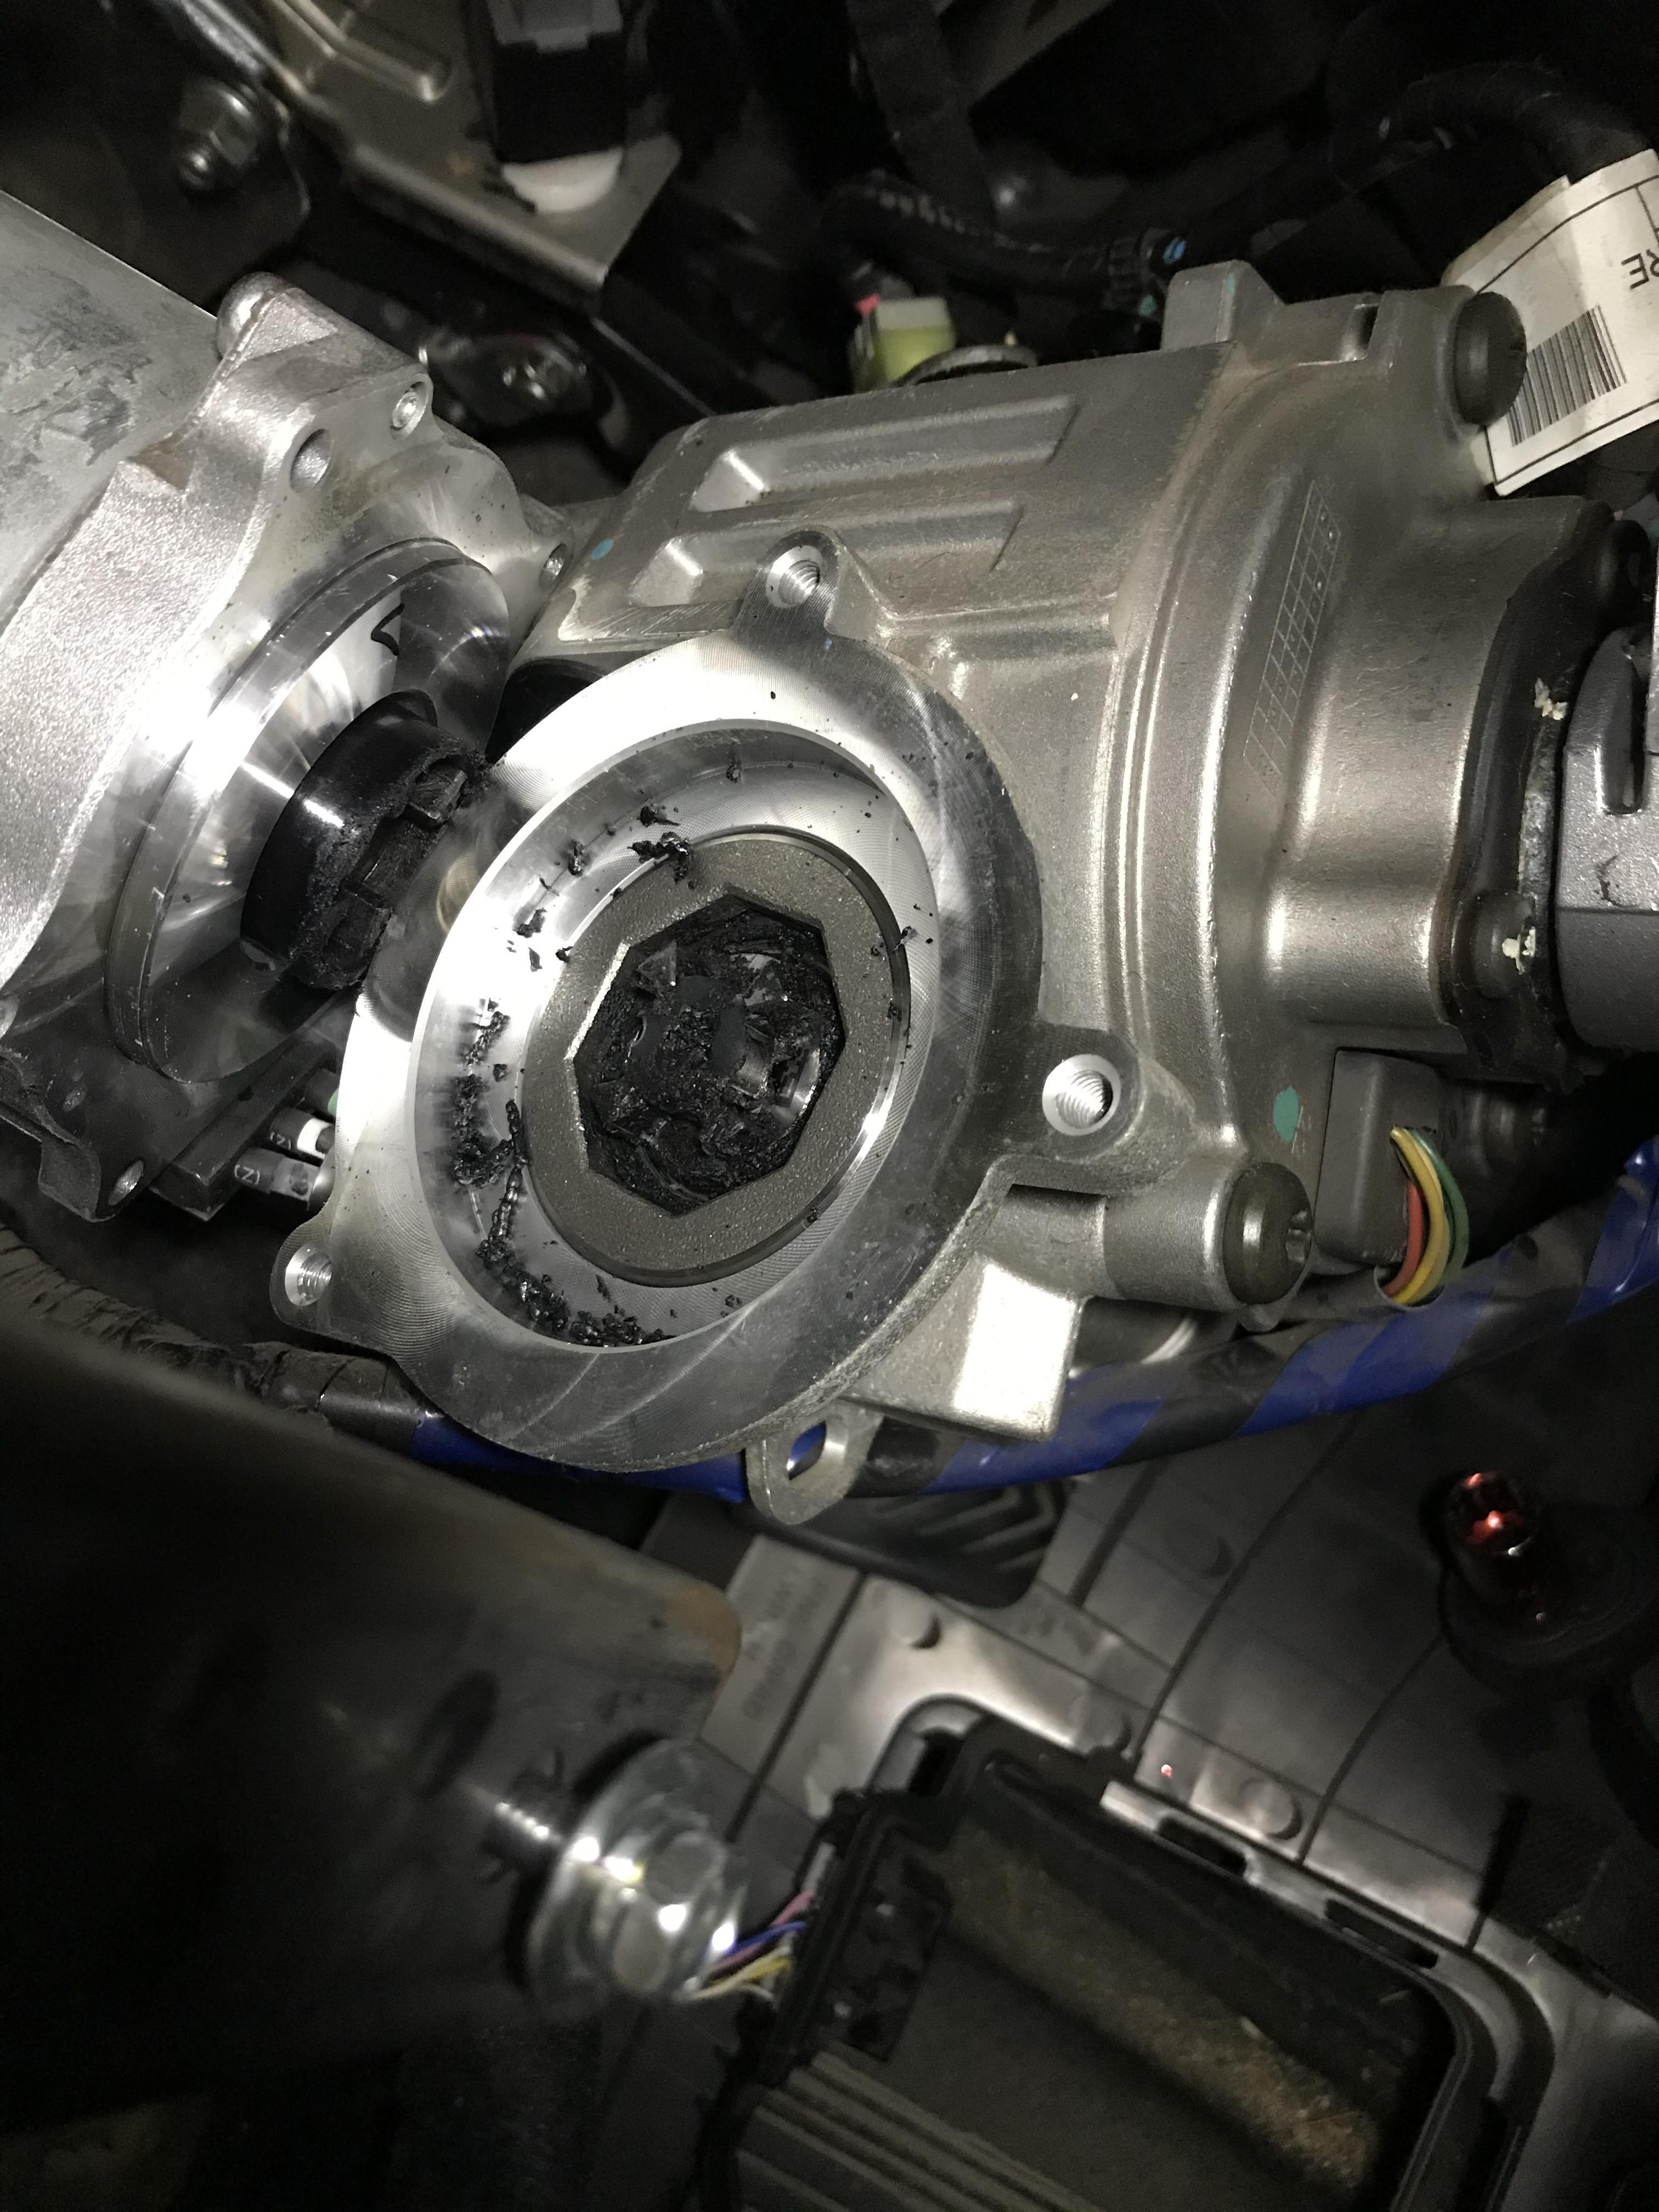 Hyundai Steering Coupler : hyundai, steering, coupler, Steering, Coupler, Kia/hyundai, Power, Motor., Rubber, Piece, Between, Metal, Gears, Pretty, Guaranteed, Fail., CrappyDesign